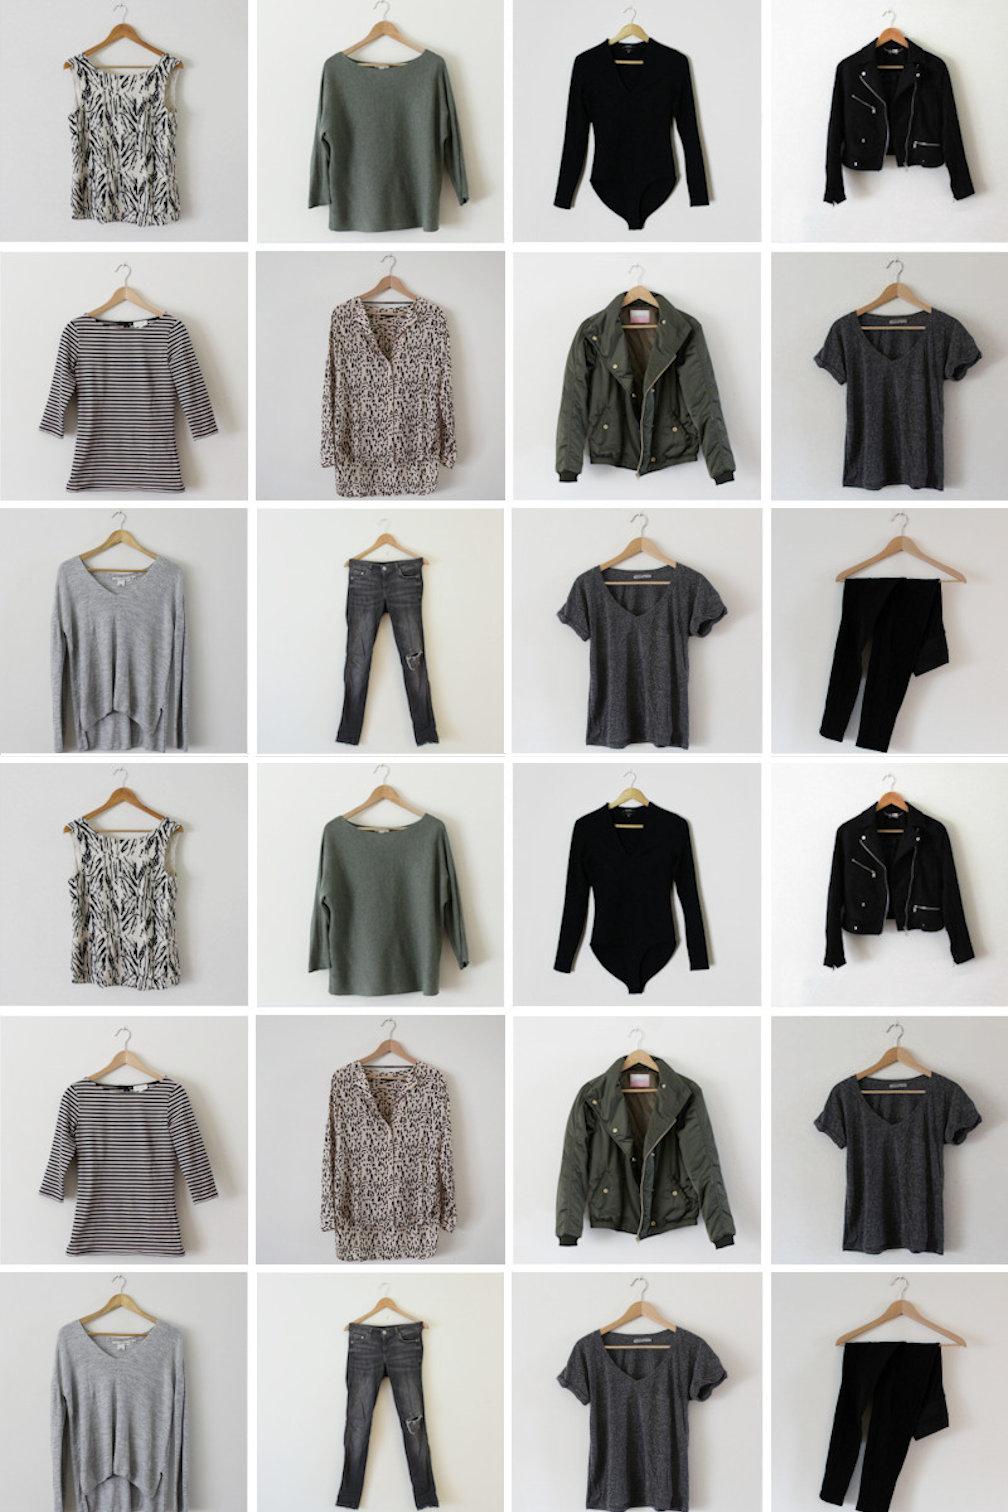 De 5 Basis Items In Mijn Capsule Wardrobe